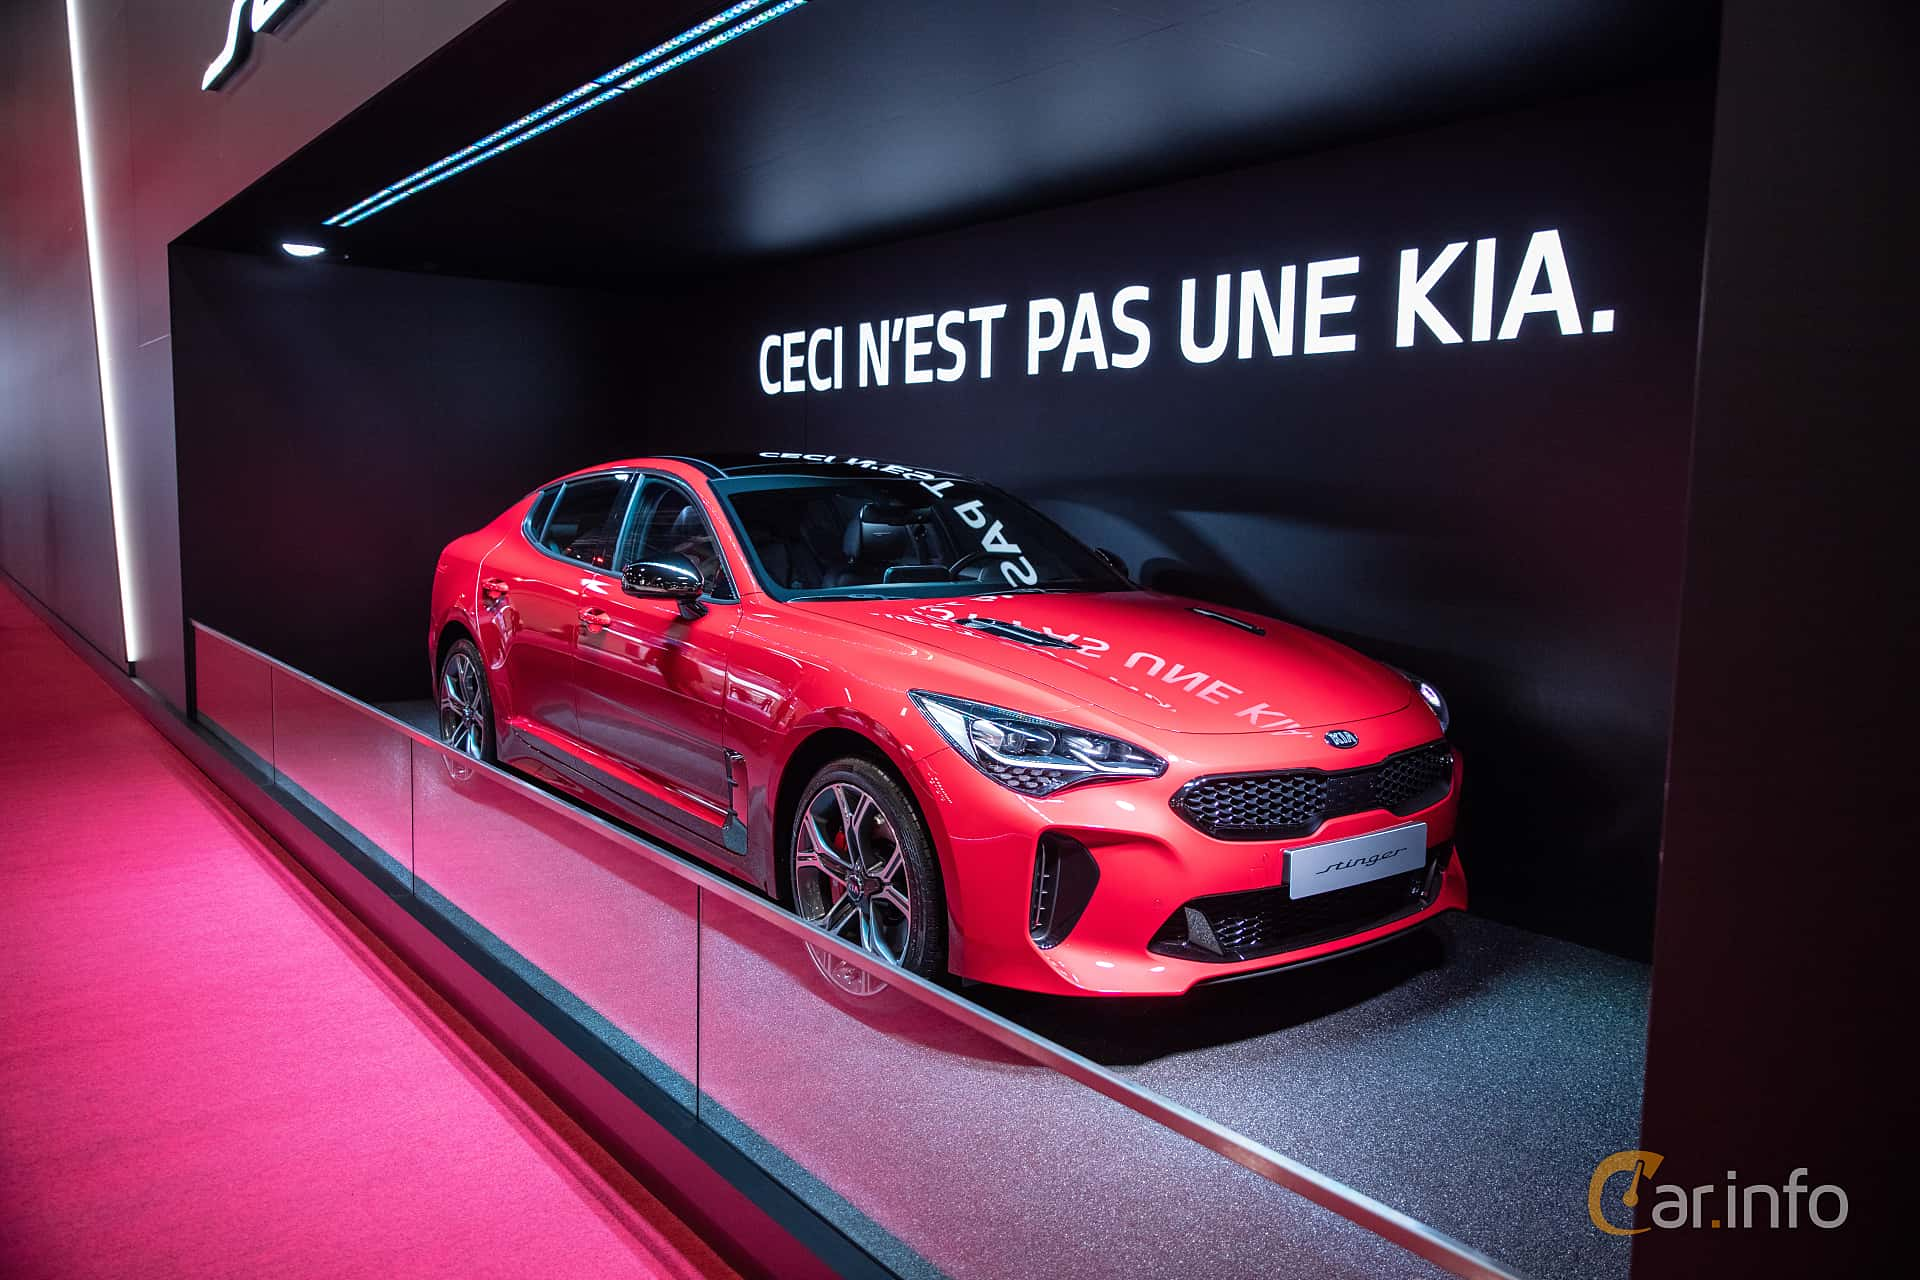 Kia Stinger GT 3.3 V6 T-GDI AWD Automatic, 370hp, 2019 at Paris Motor Show 2018